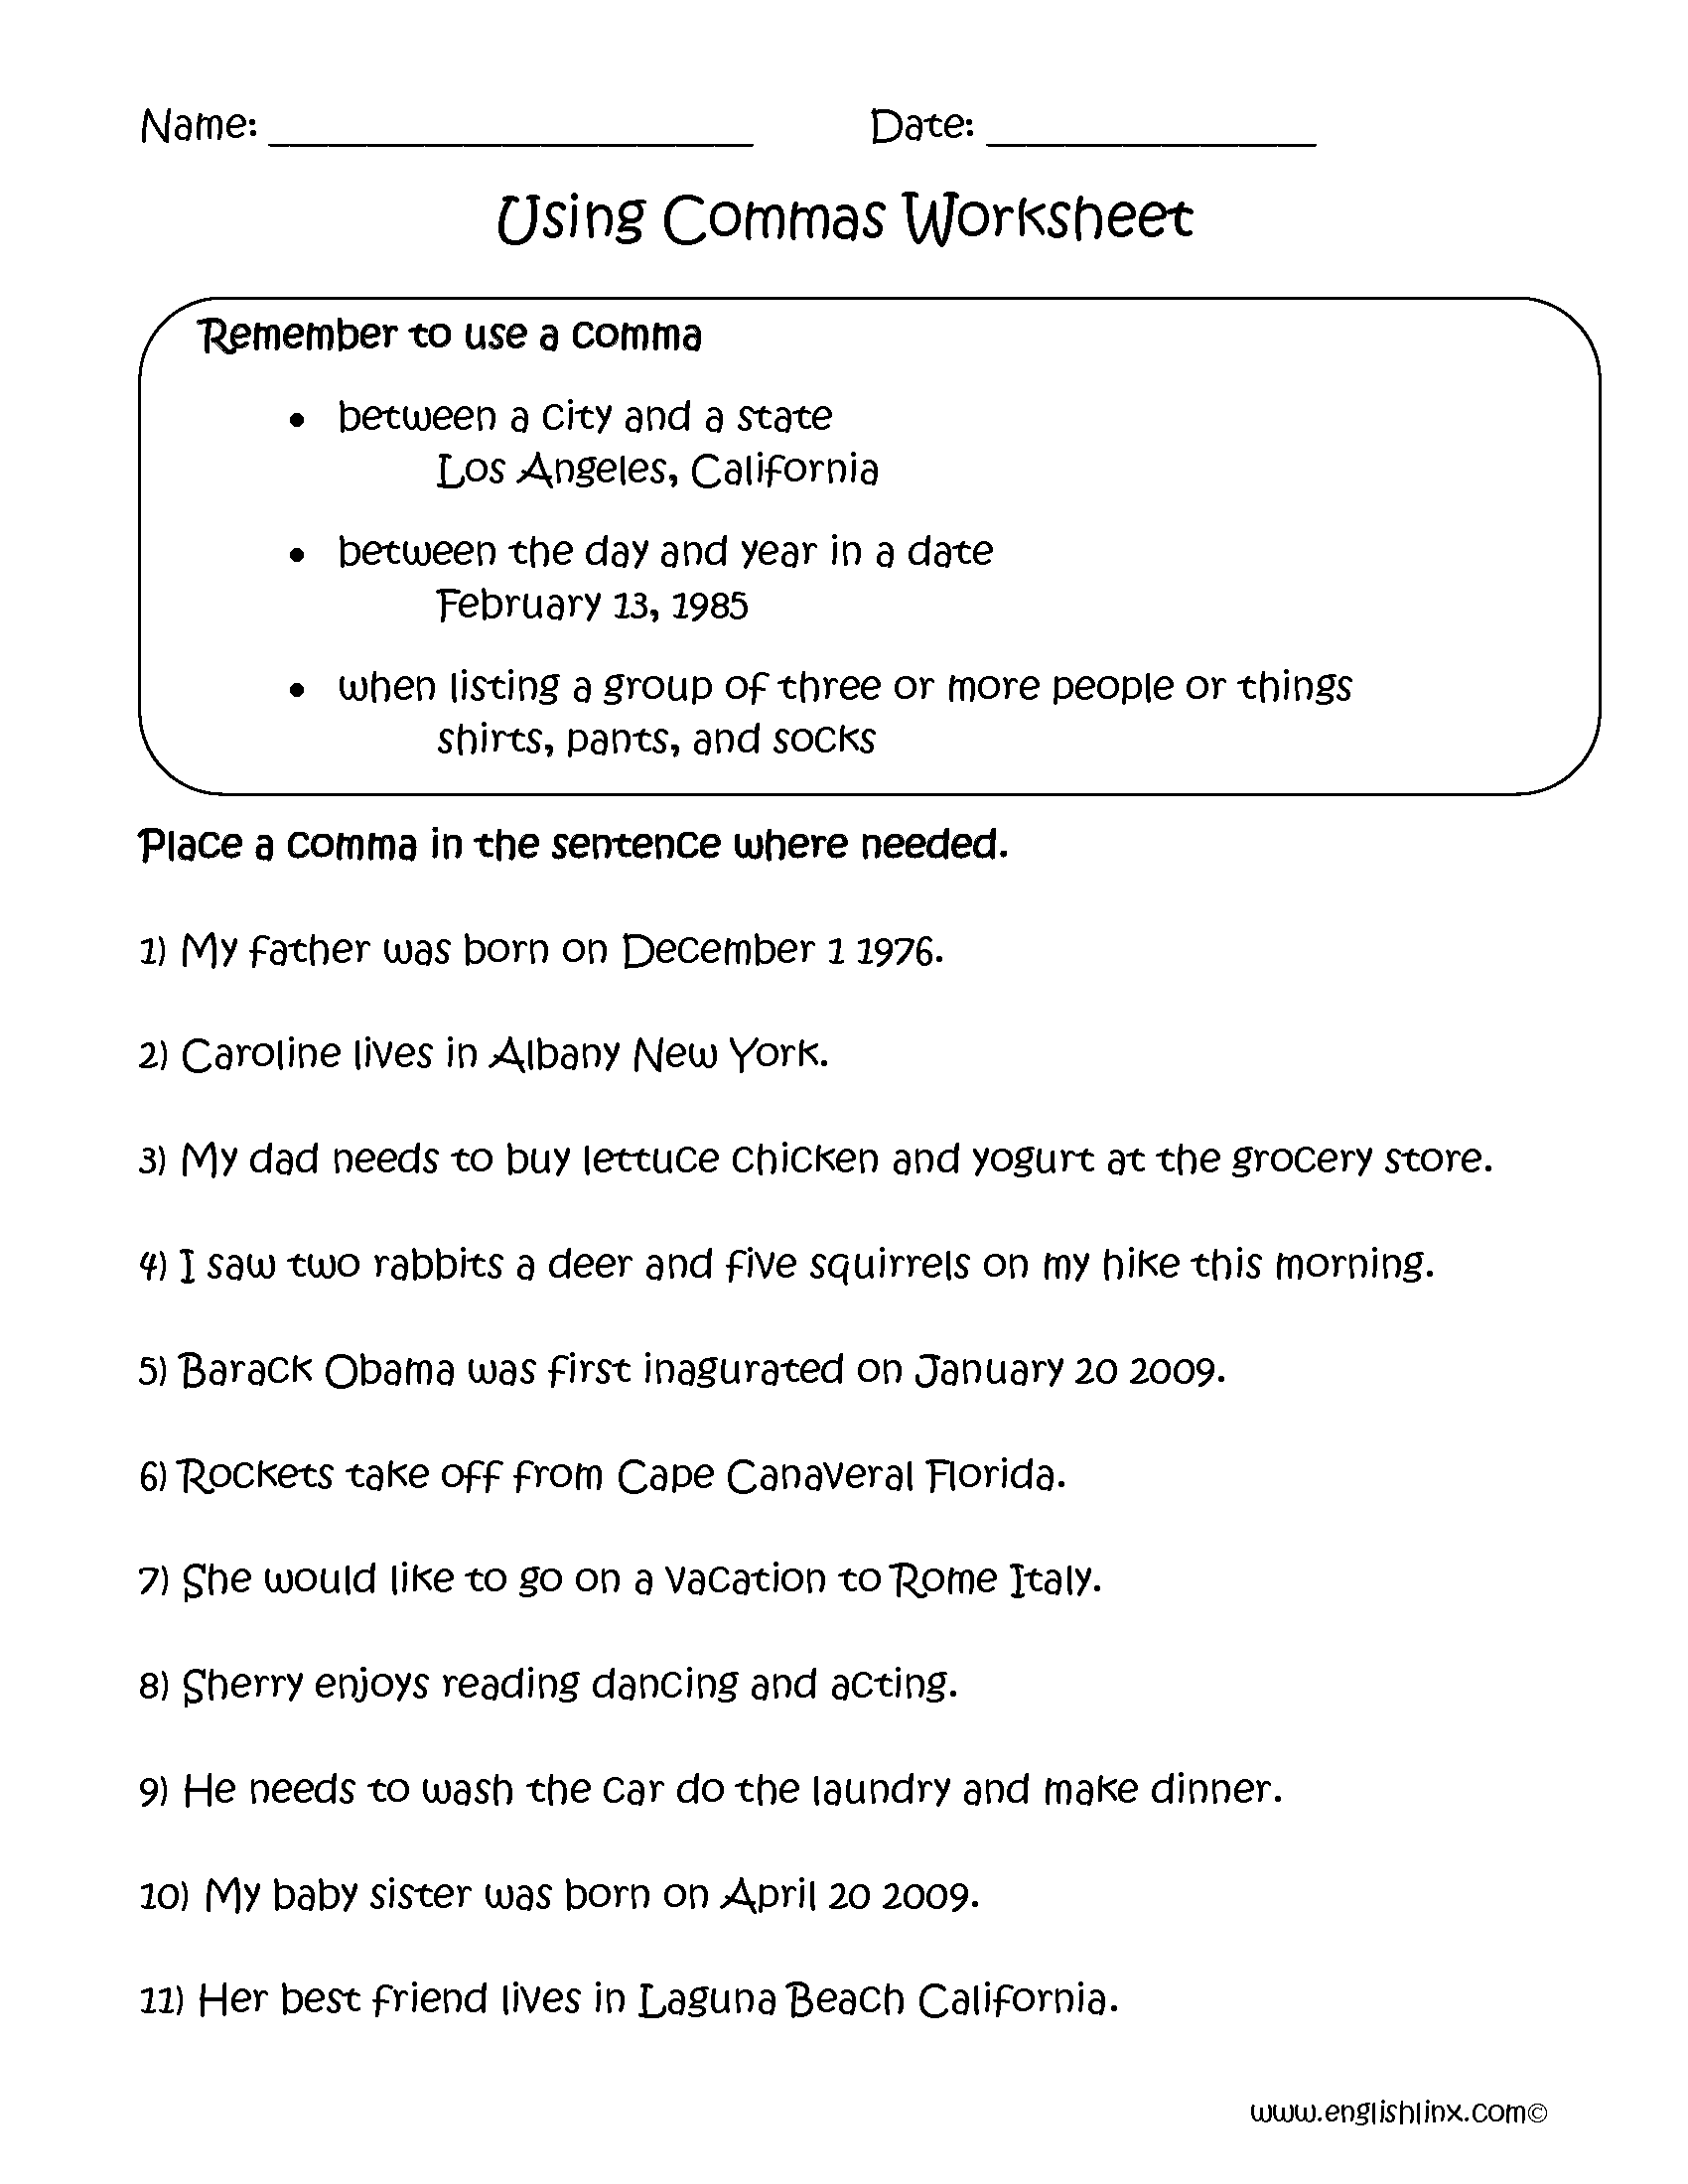 hight resolution of Pin on Englishlinx.com Board